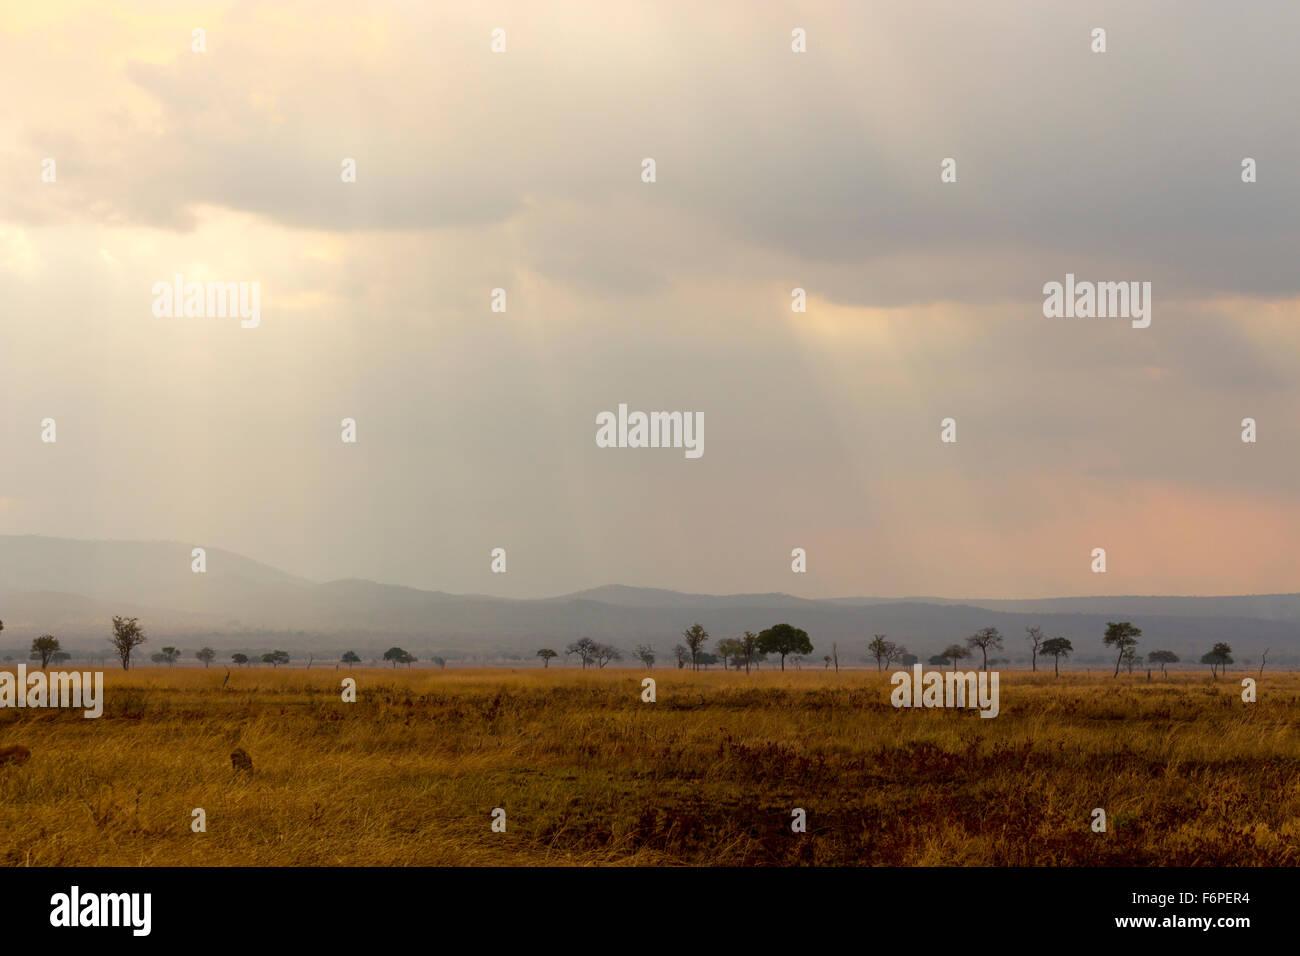 African Savannah, taken on Safari in mikumi national park. Sun rays are shining down. - Stock Image